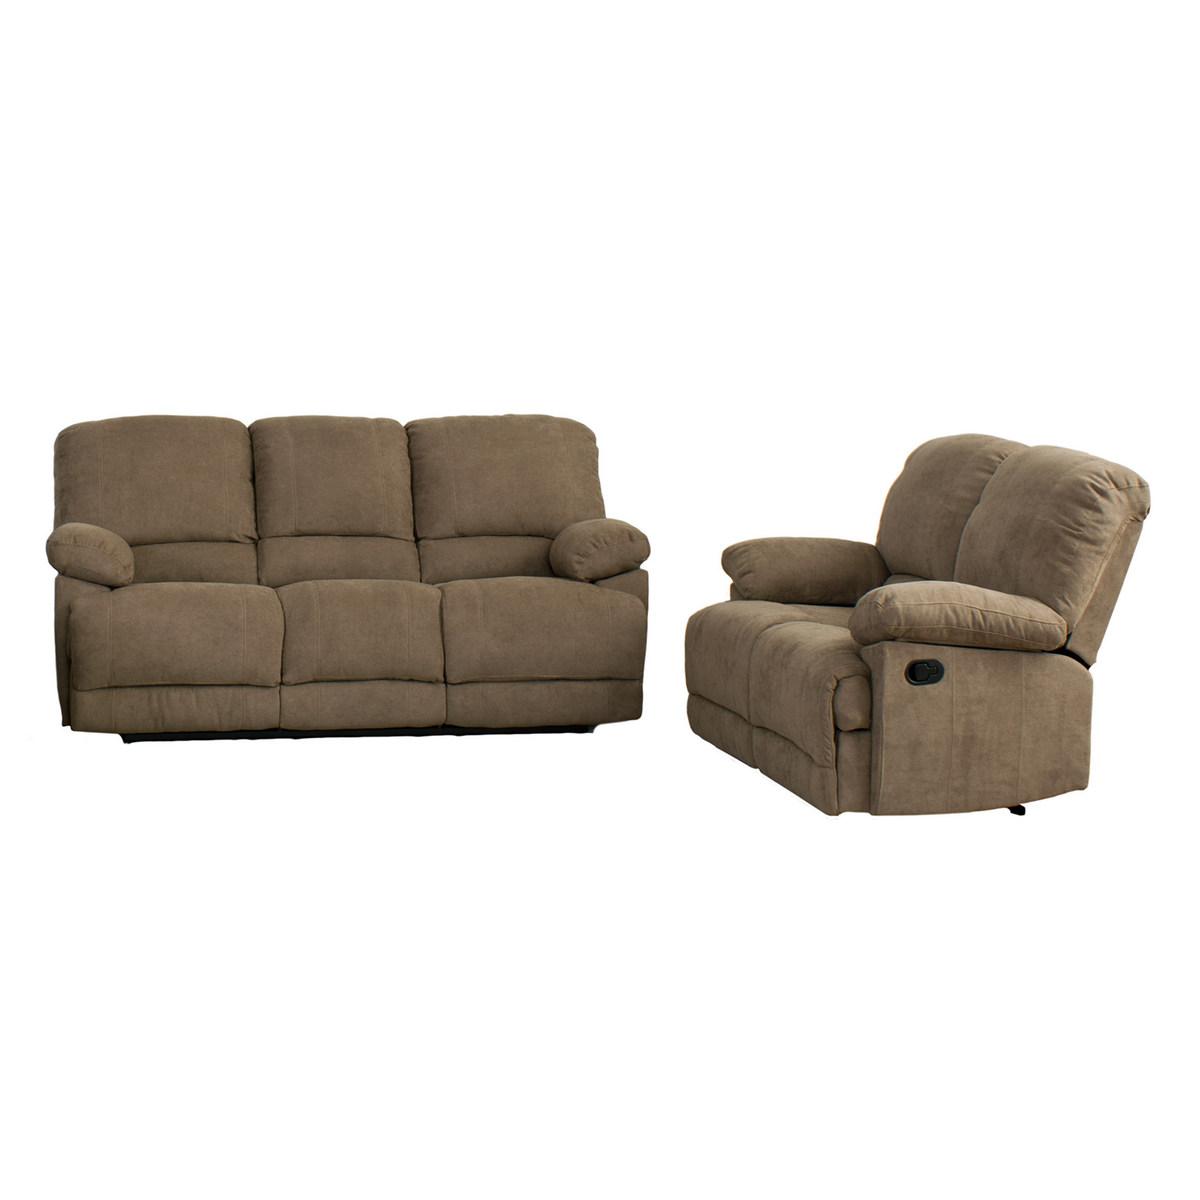 Corliving Brown Fabric Reclining Sofa Set